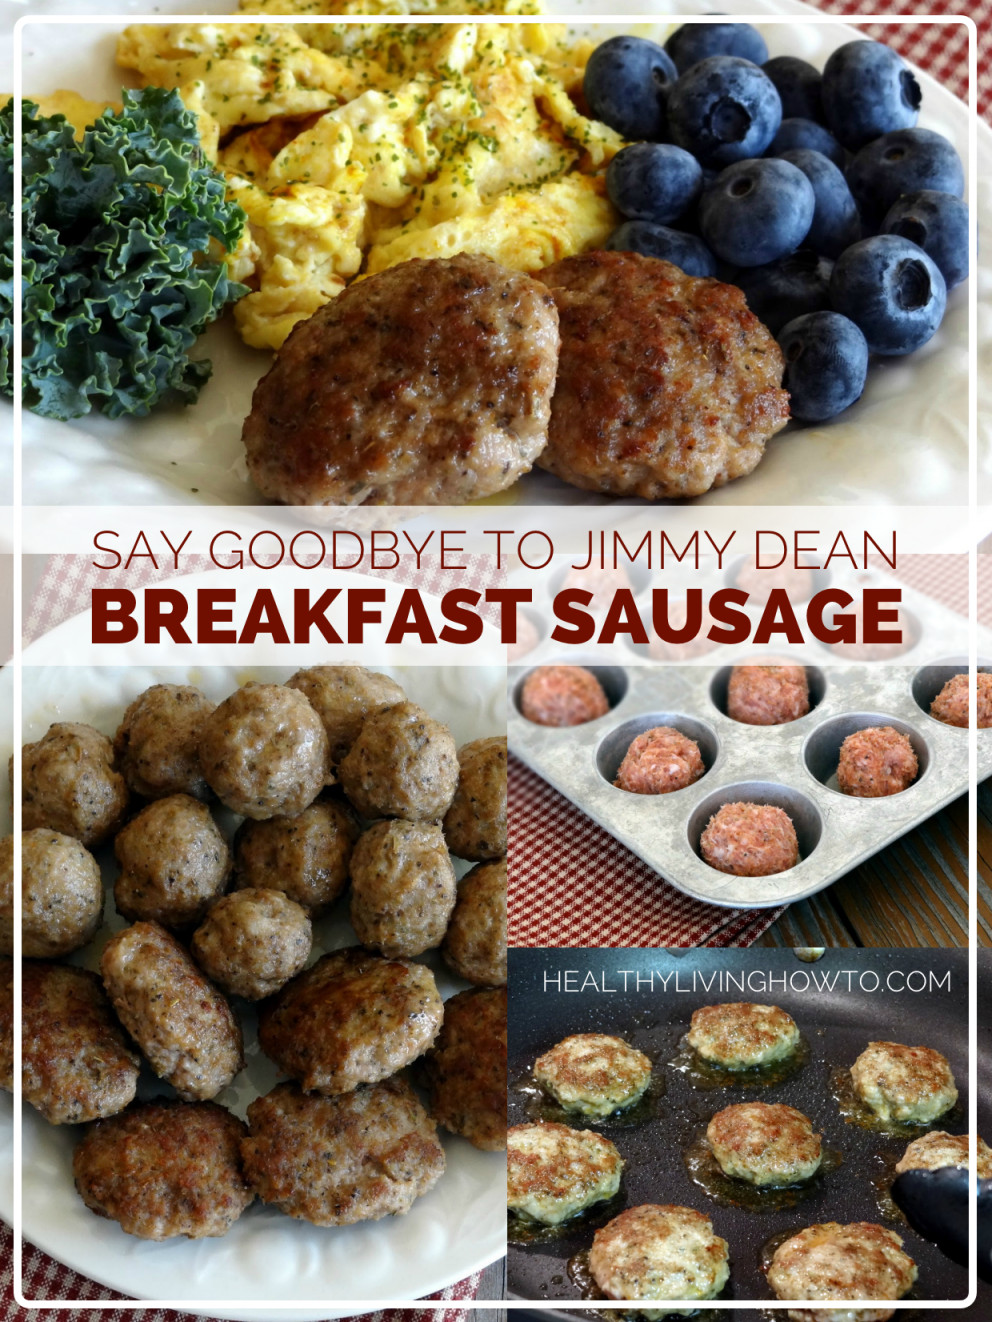 Healthy Breakfast Sausage  Life Sources Blog